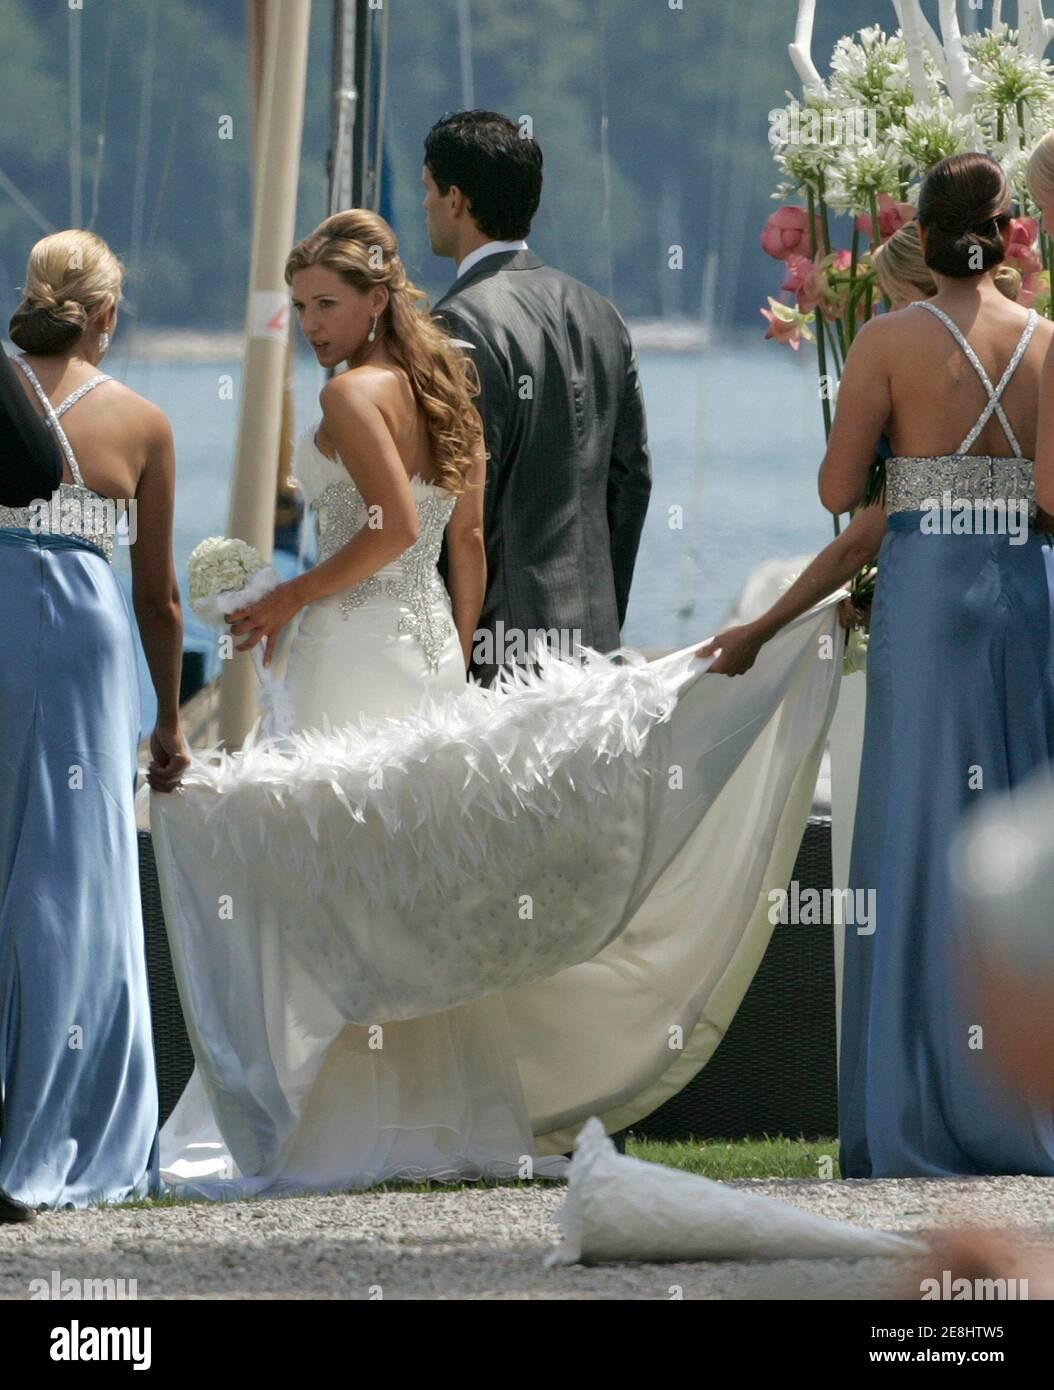 Michael Ballack Wife Simone Ballack Stockfotos Und Bilder Kaufen Alamy